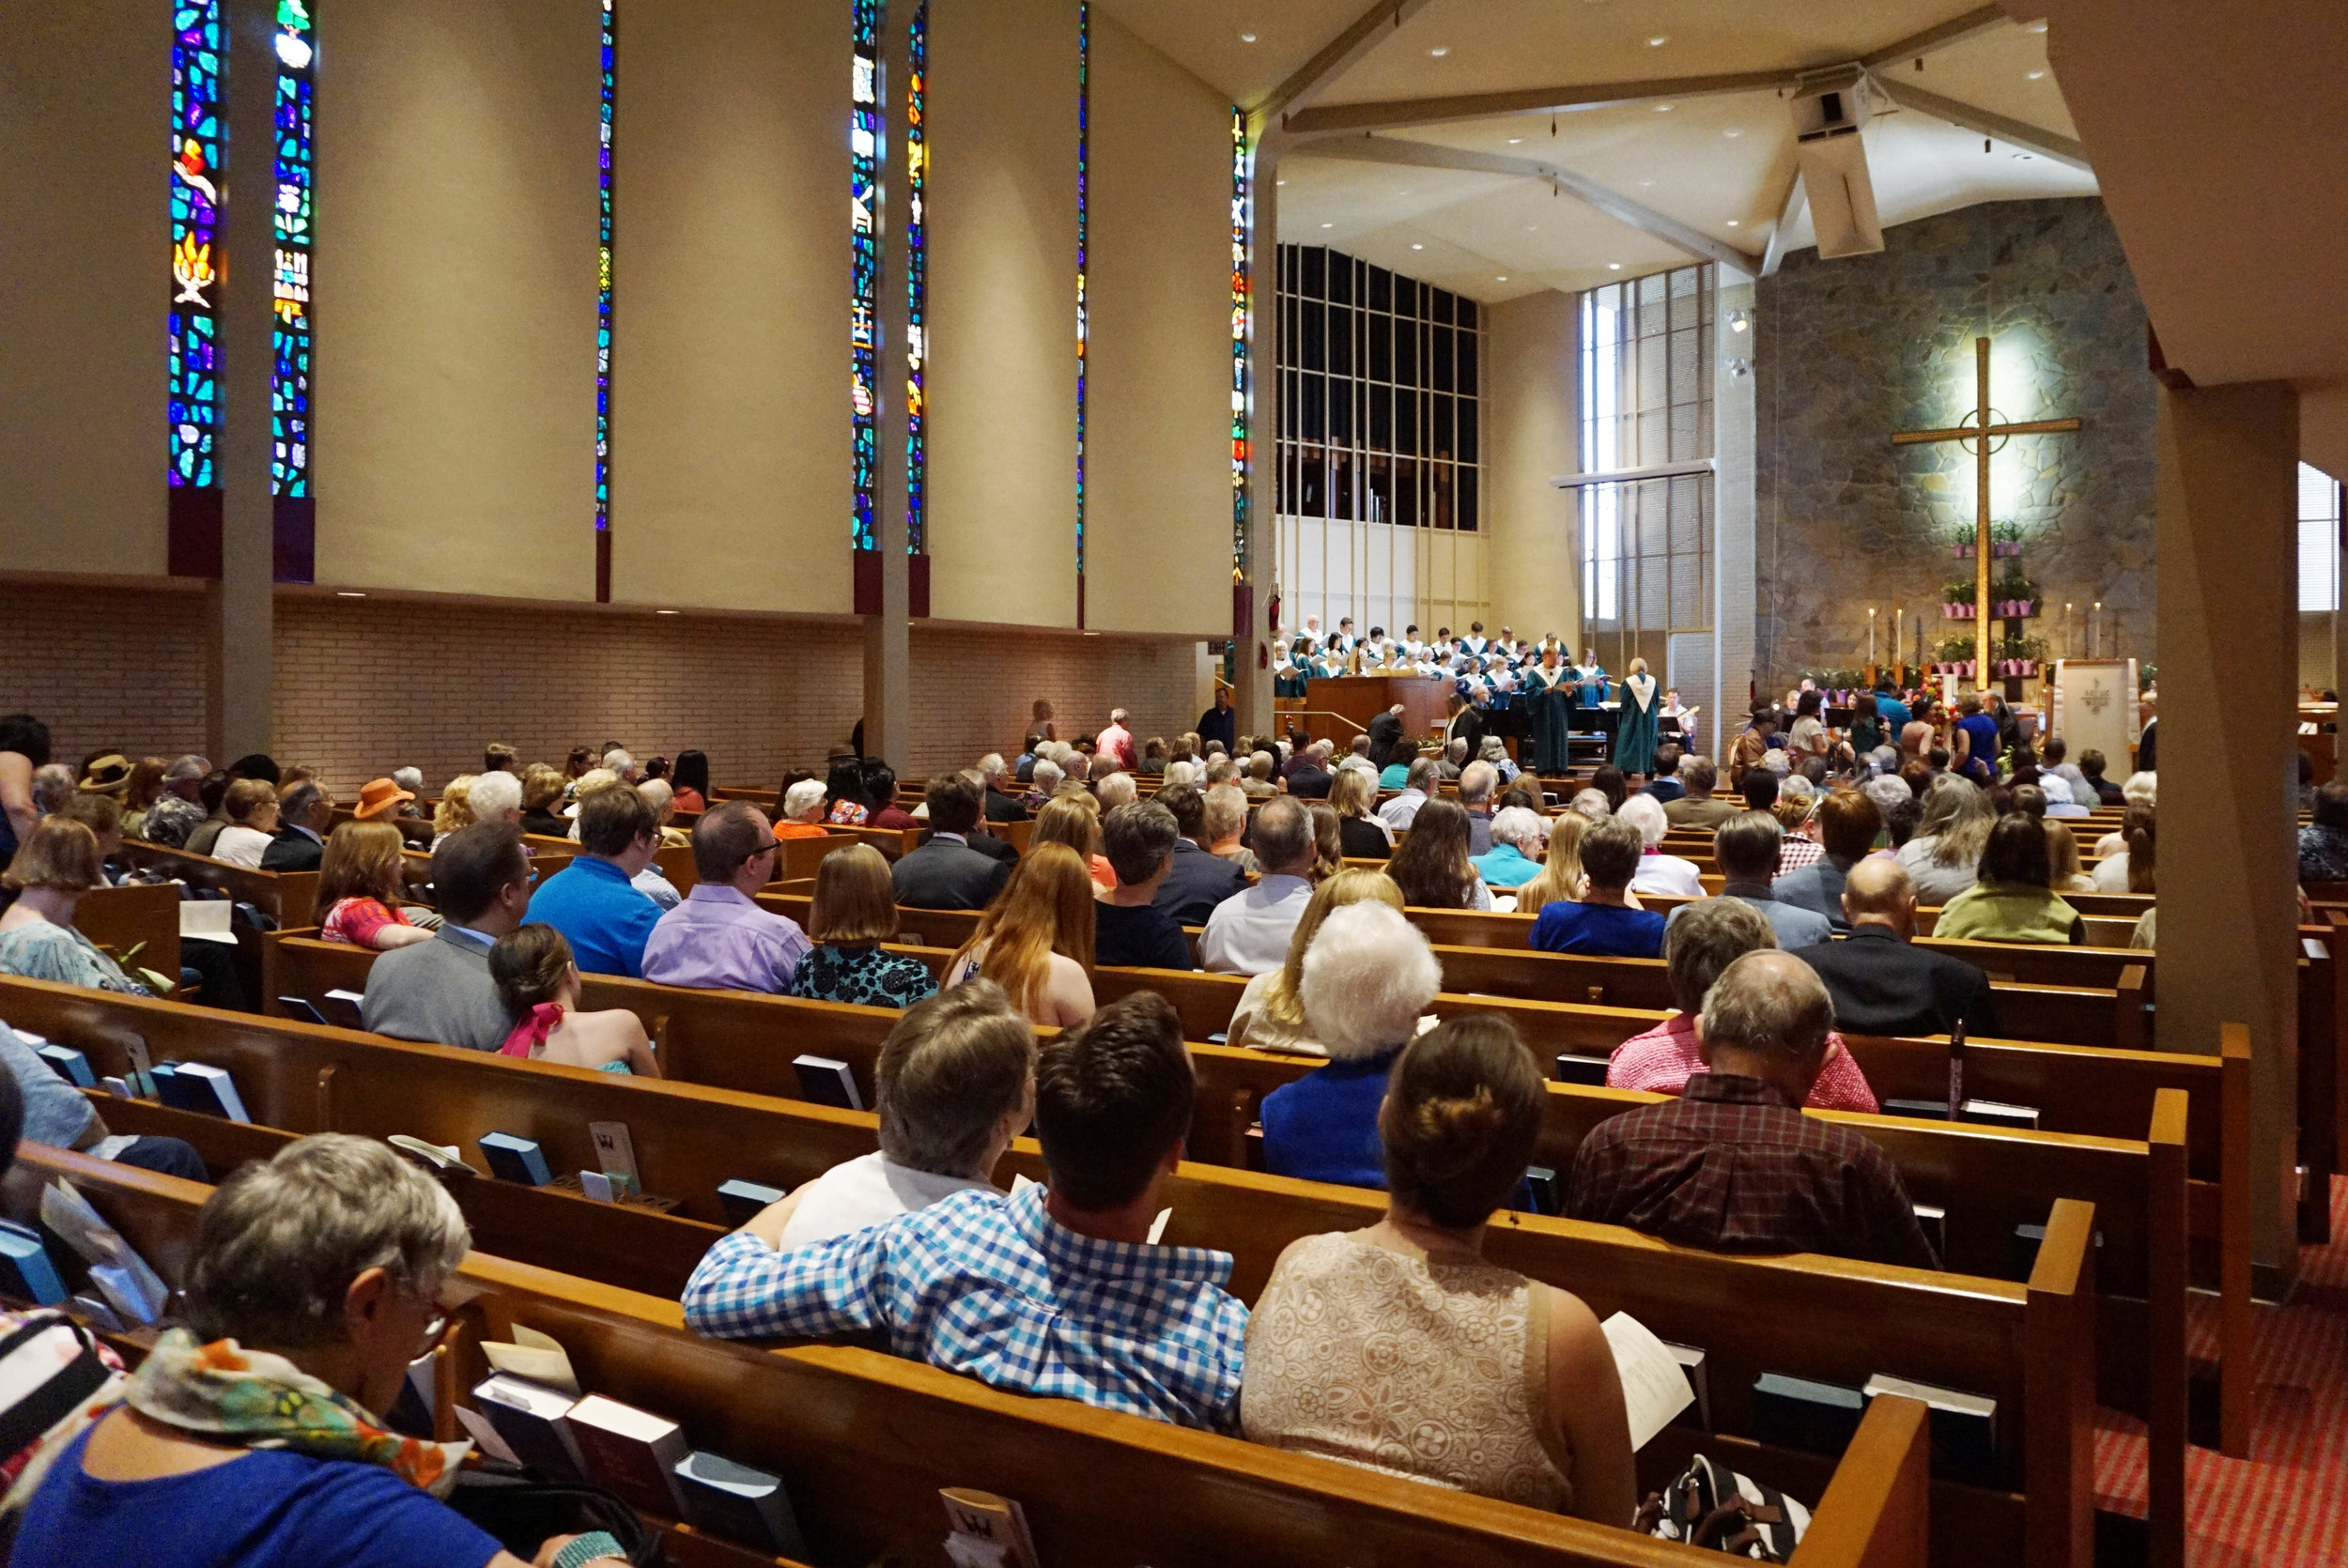 claremont-presbyterian-church-sanctuary-service.jpg